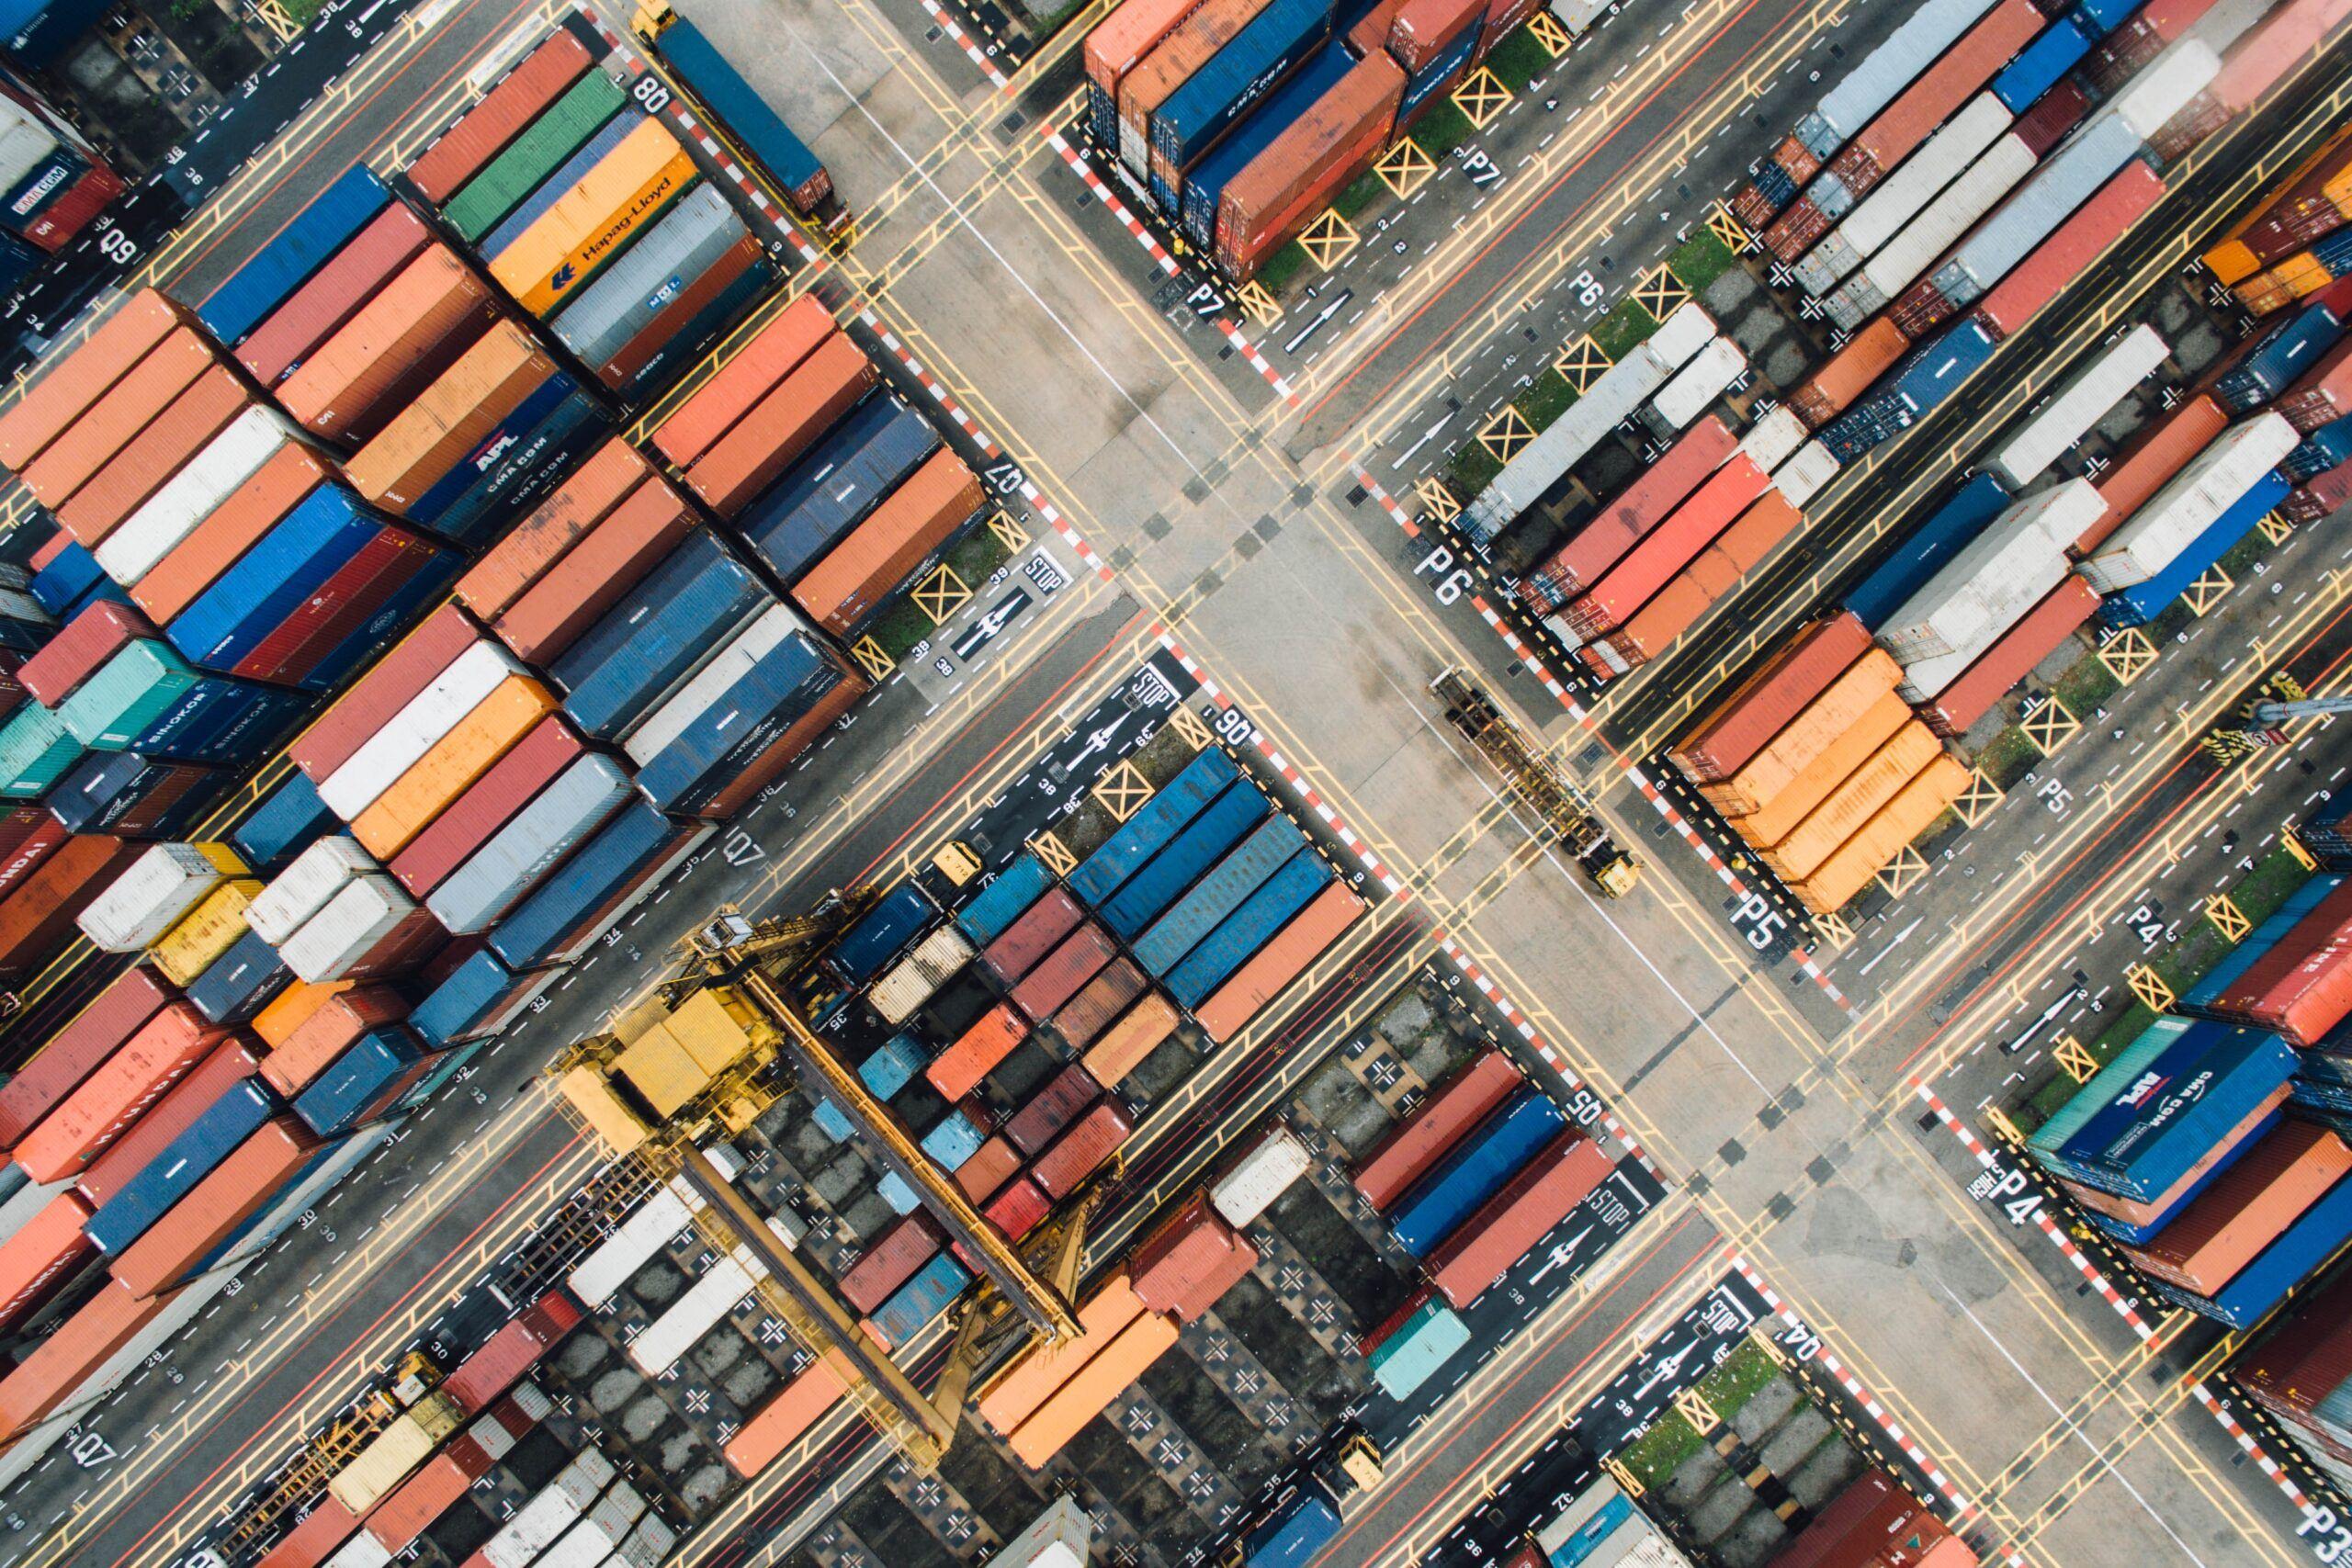 Distribution - lorries and storage